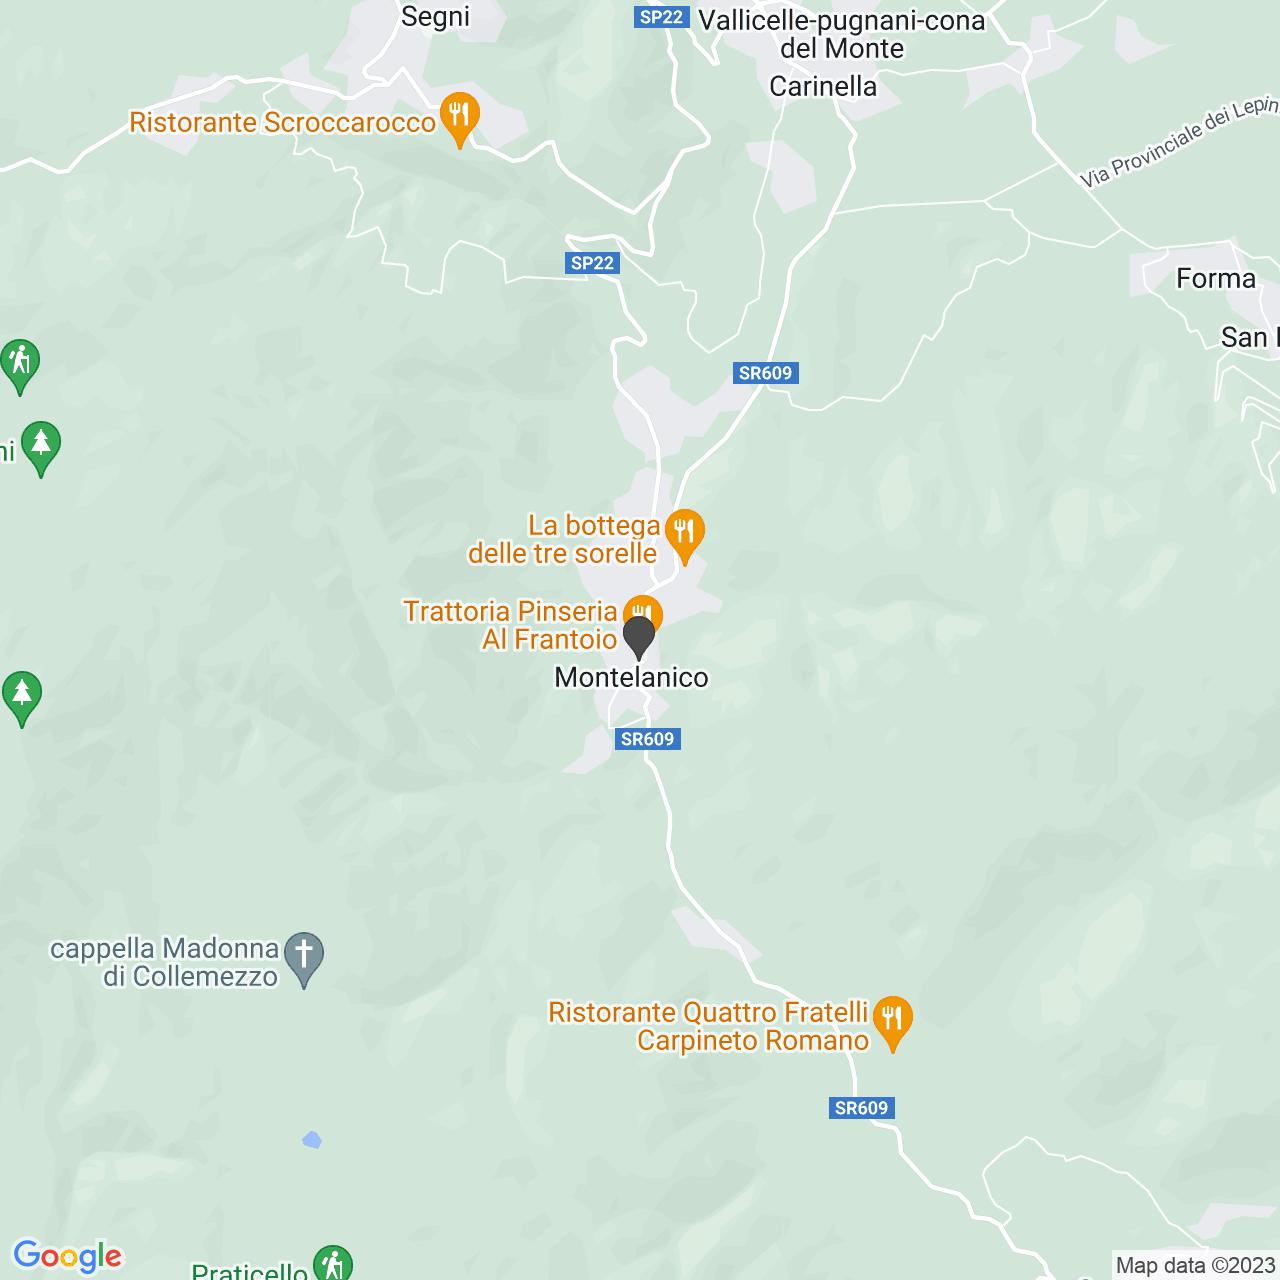 Agenzia Funebre Calcatelli